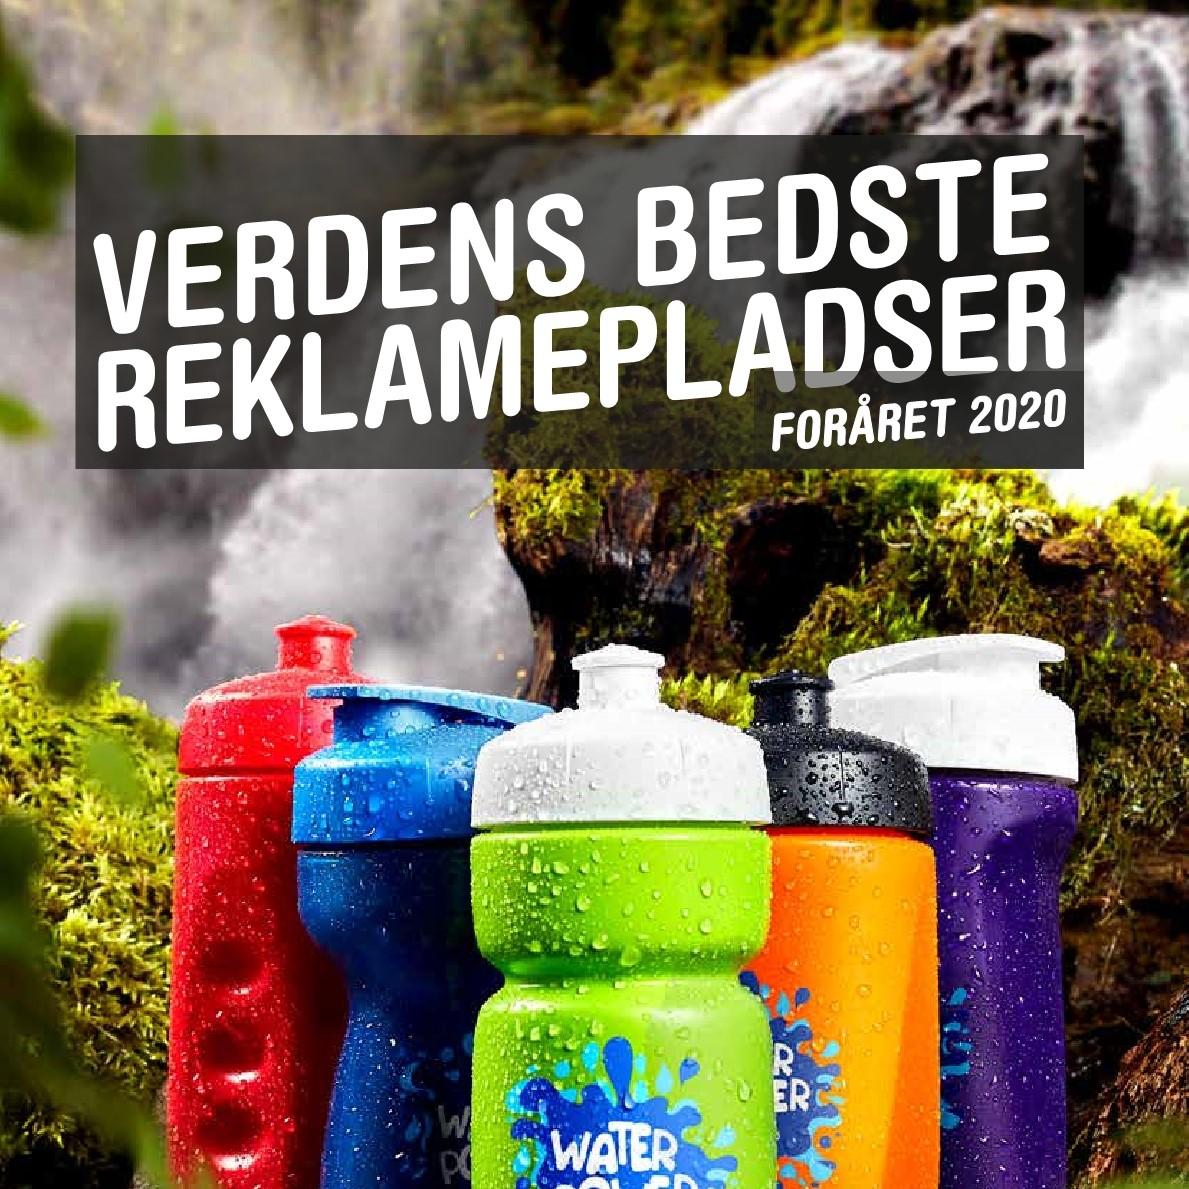 plast_print_katalog_reklamegaver_firmagaver